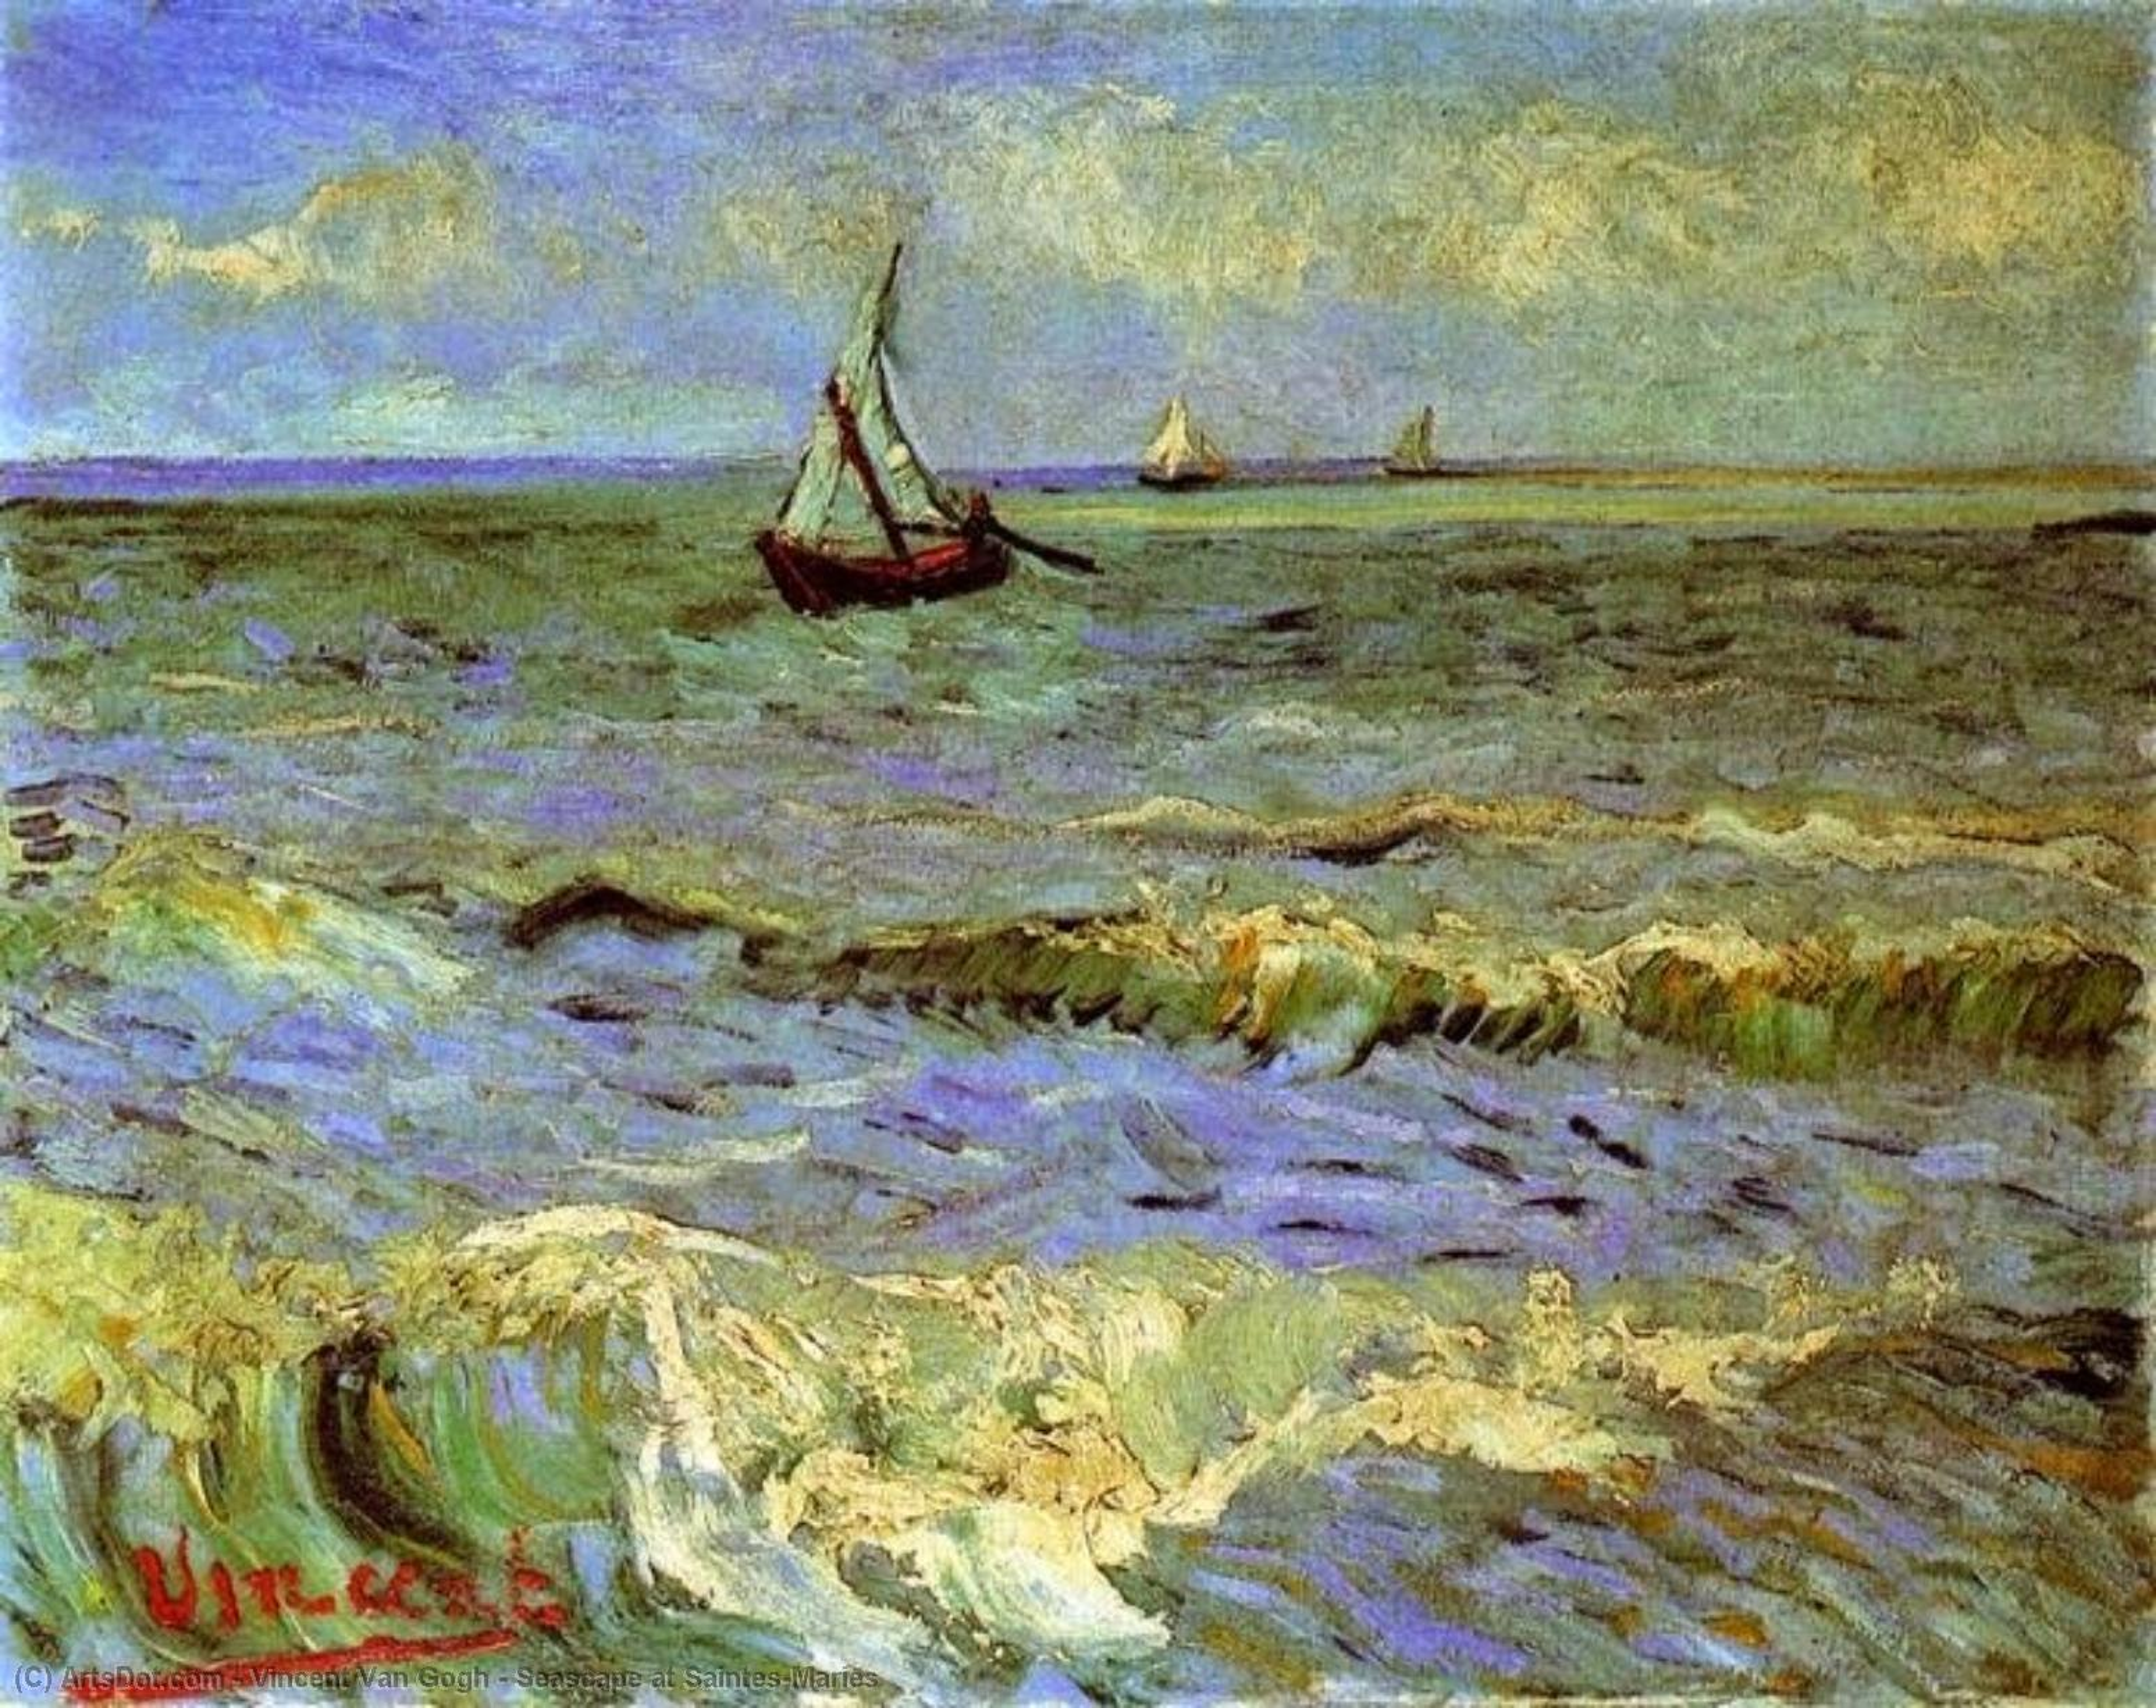 WikiOO.org - Enciklopedija dailės - Tapyba, meno kuriniai Vincent Van Gogh - Seascape at Saintes-Maries